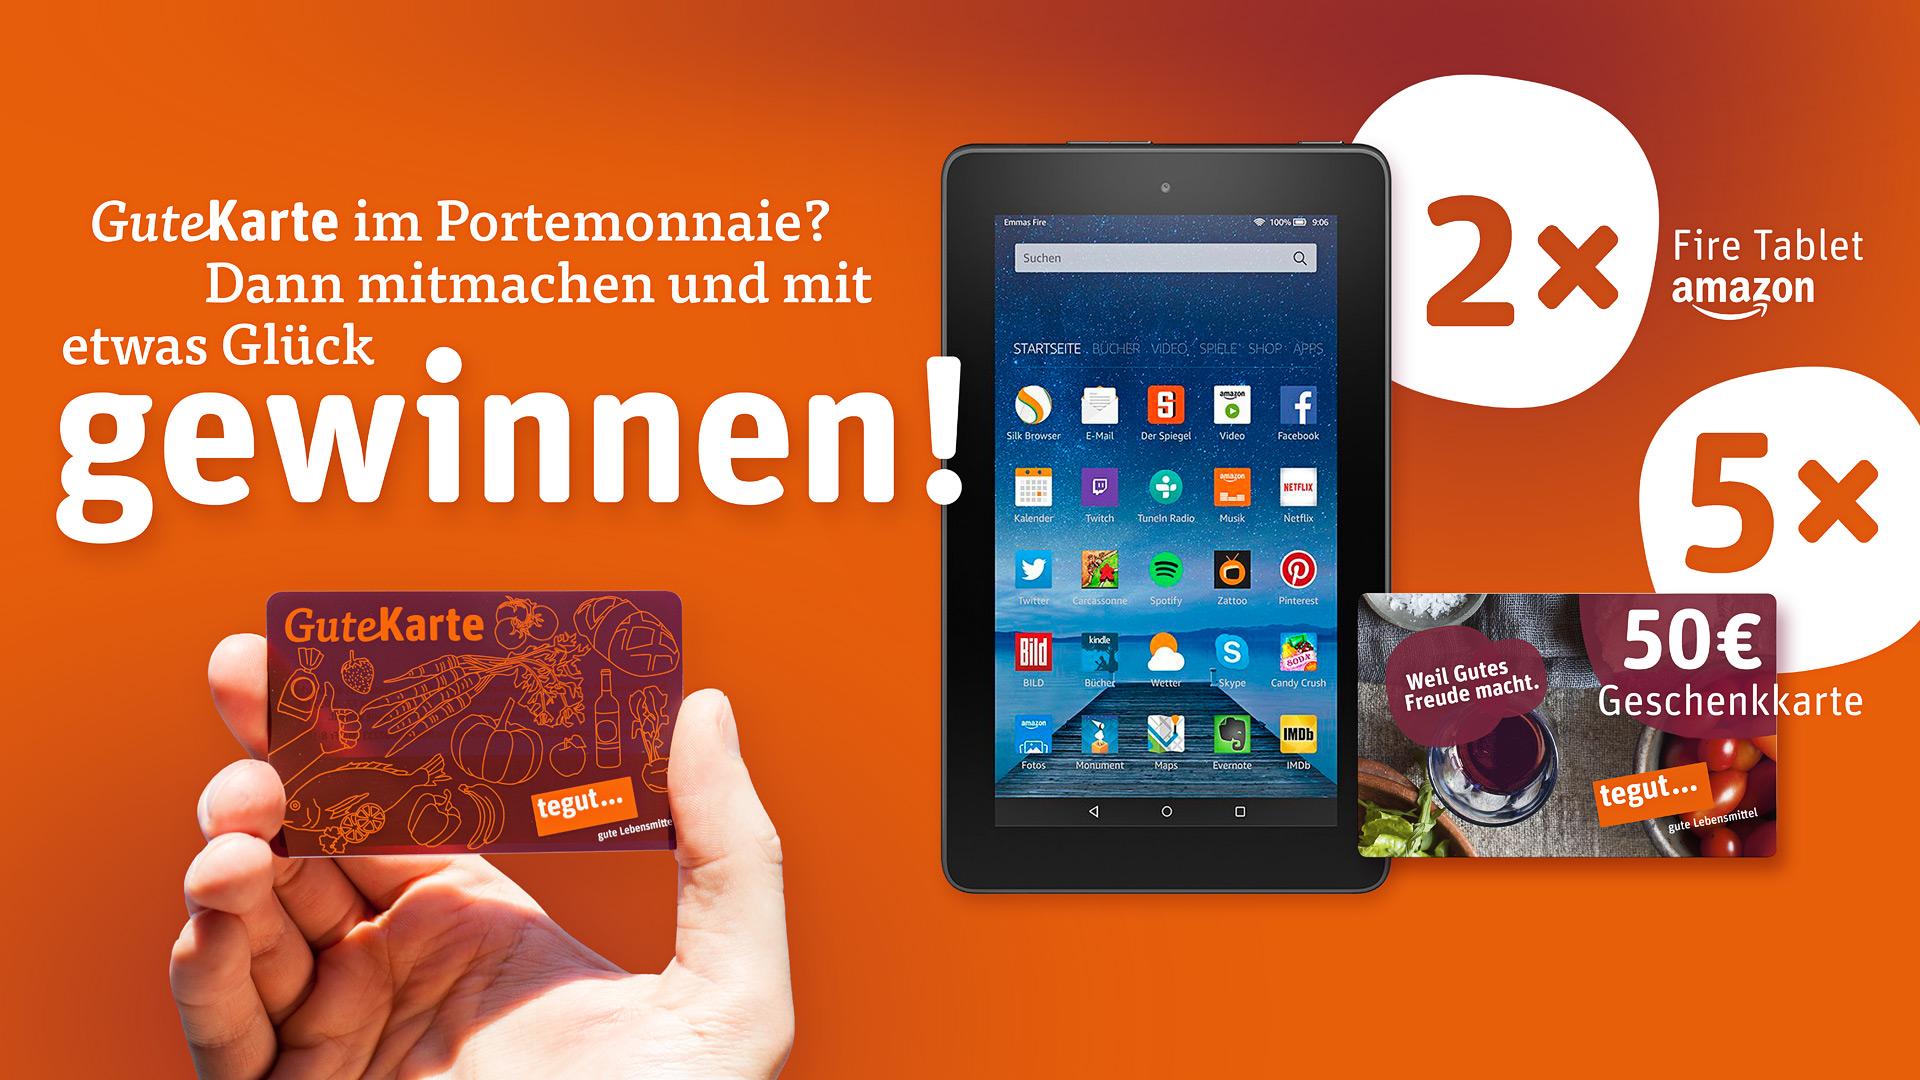 tegut gute karte GuteKarte Gewinnspiel: Amazon Kindle Fire oder tegut